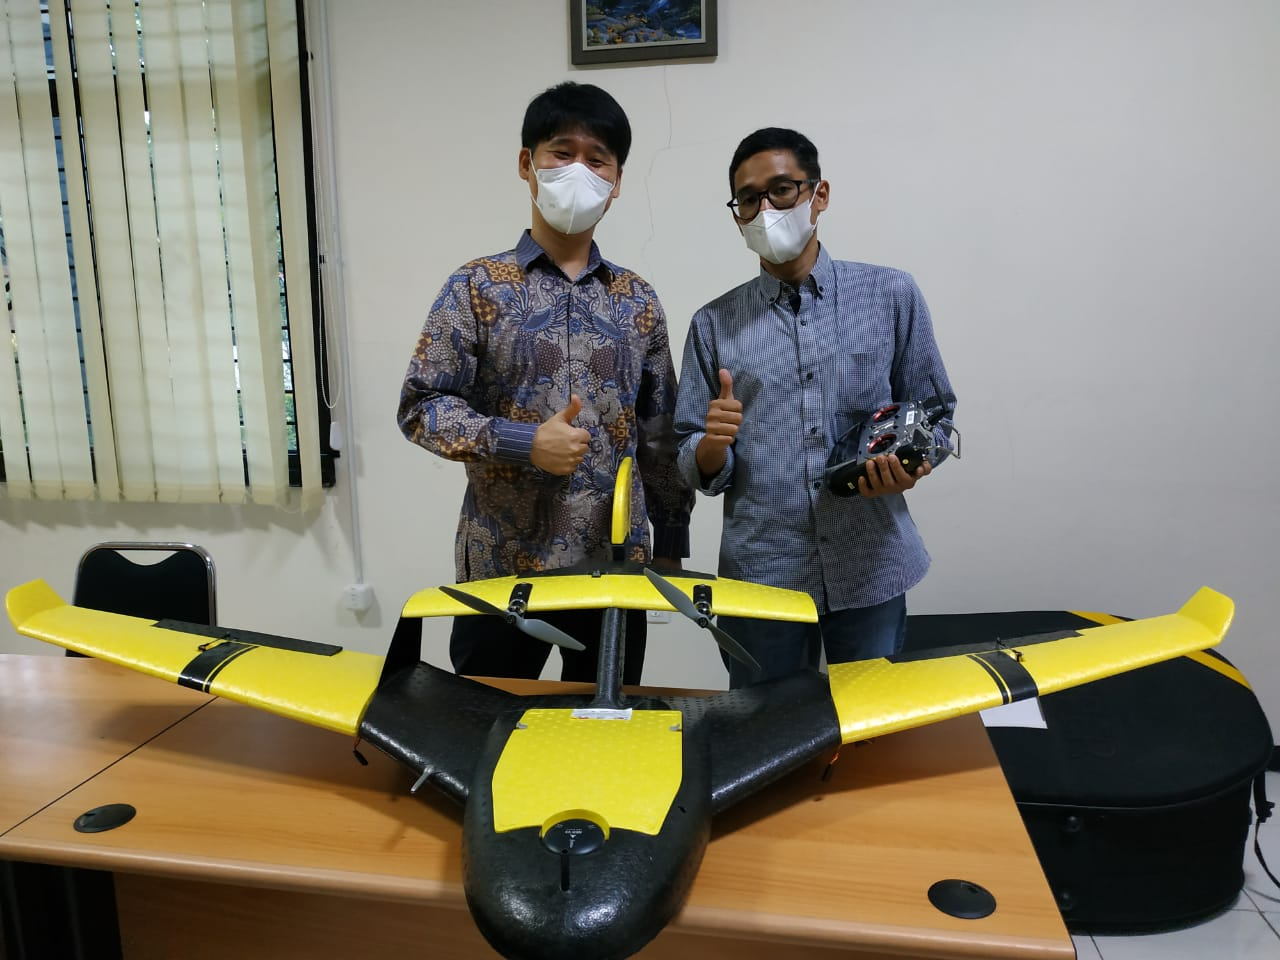 Pertemuan dan Koordinasi MTCRC dan FITB di Kampus ITB Watubelah, Cirebon